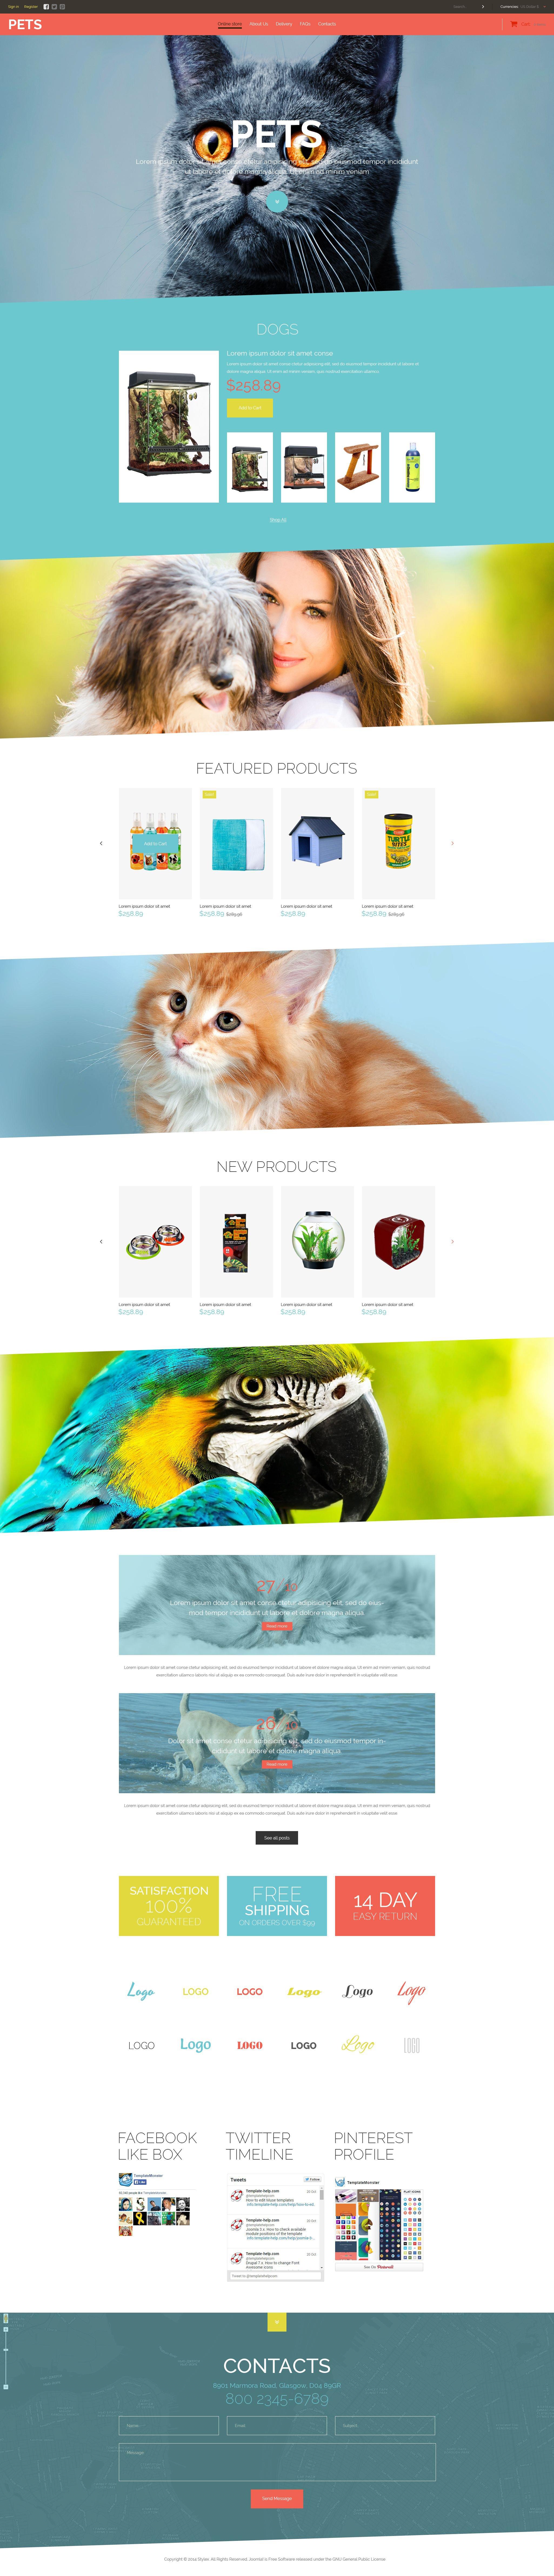 Pet Store Virtuemart #52331 - Ekran resmi